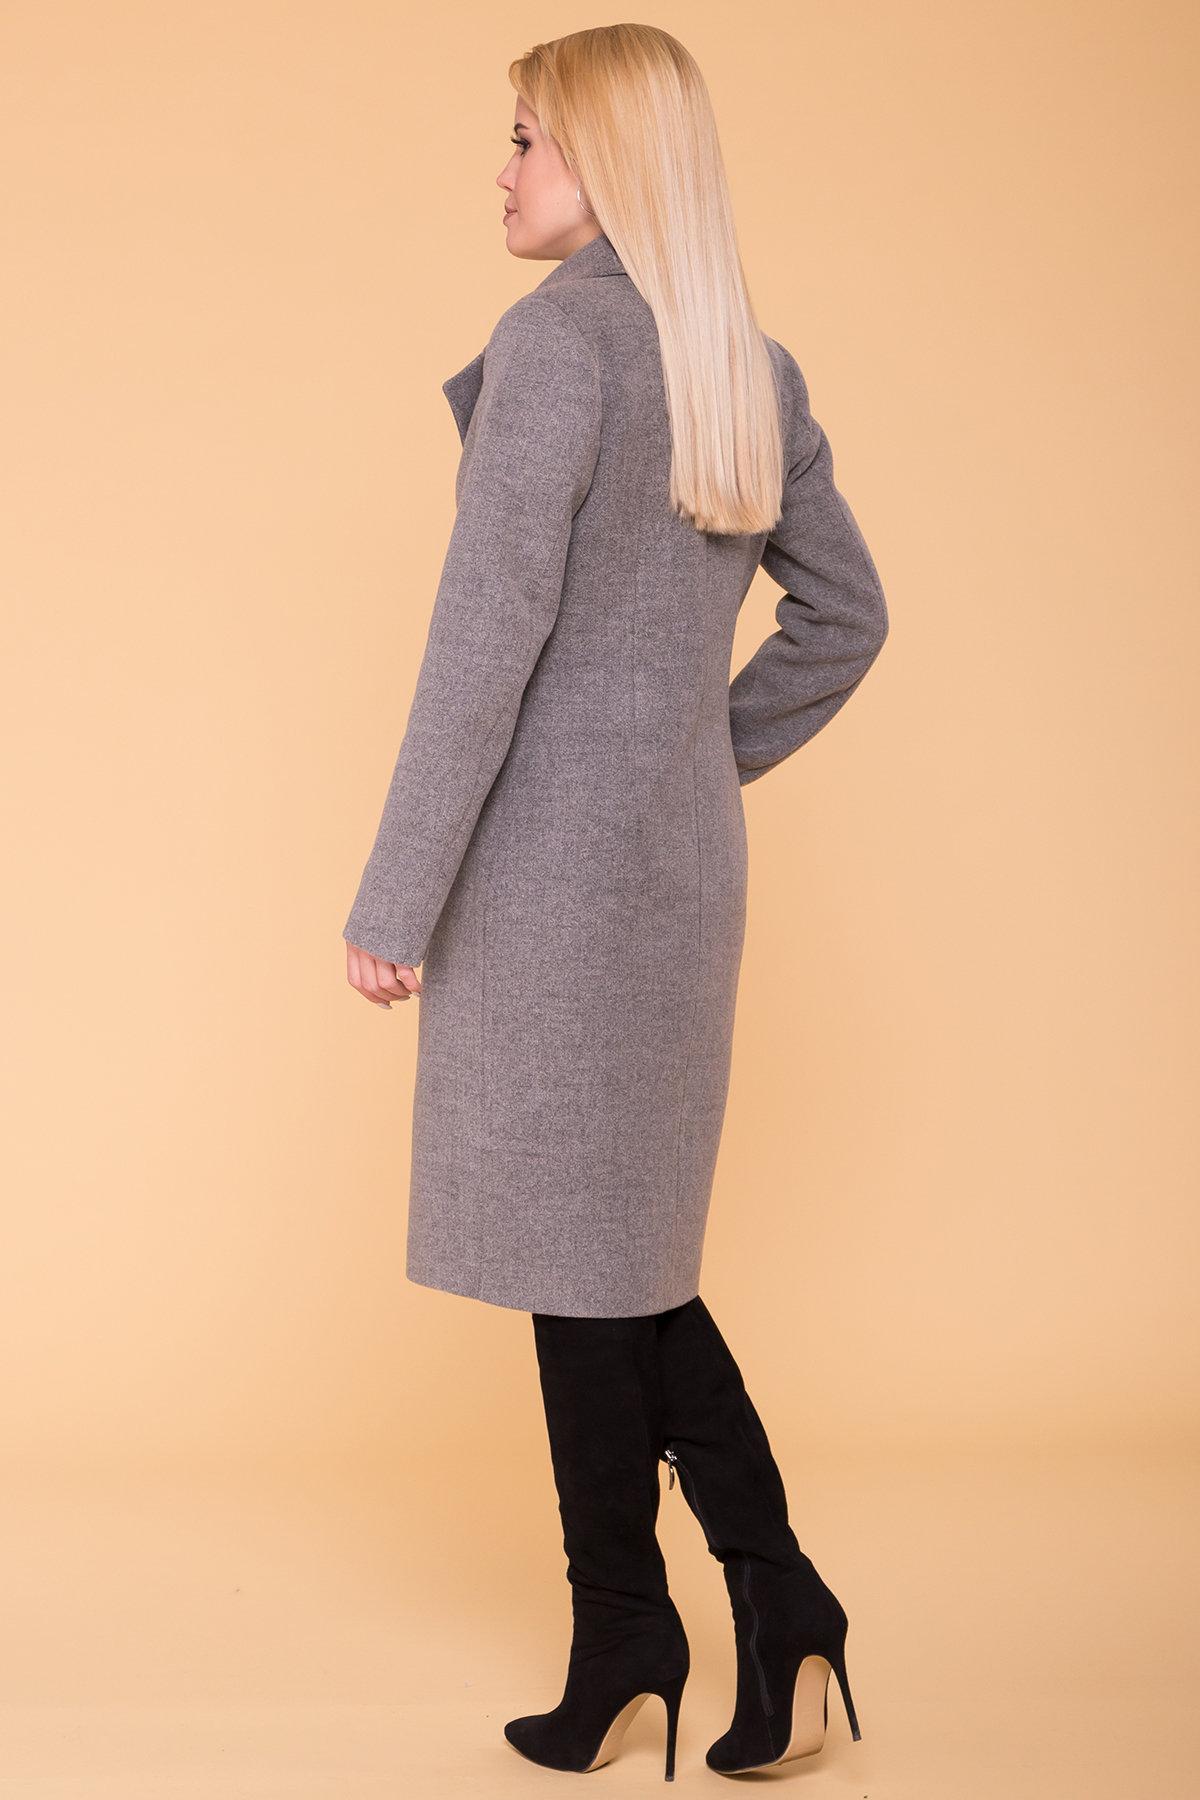 Пальто Габриэлла 7876 АРТ. 43819 Цвет: Серый 18 - фото 3, интернет магазин tm-modus.ru